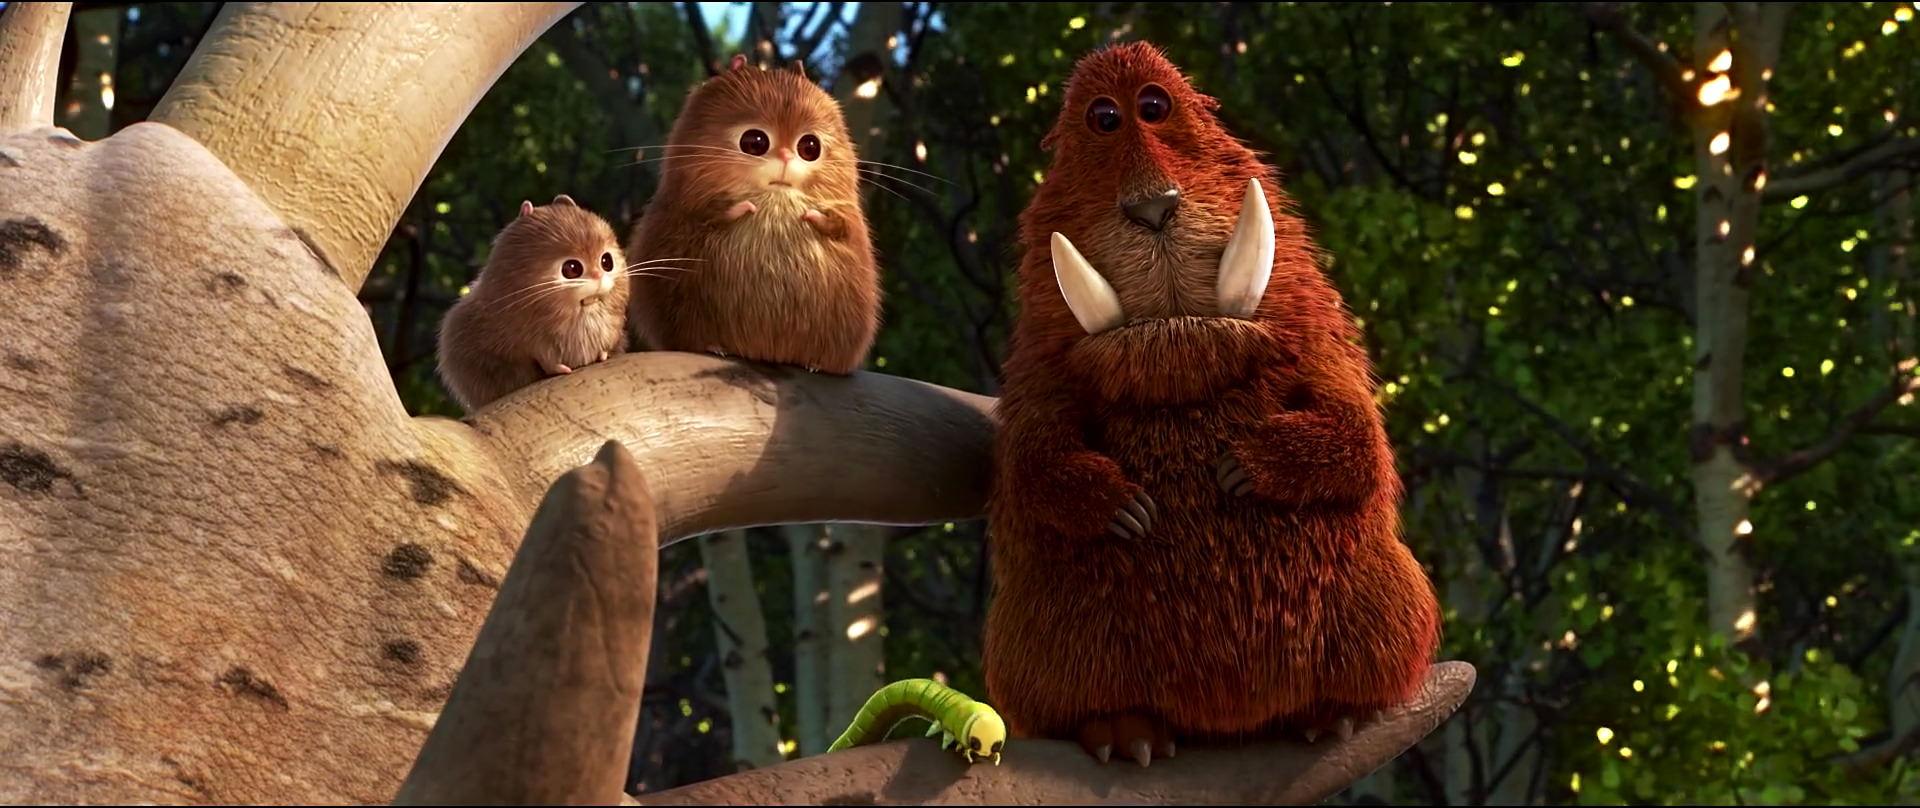 Dream-crusher briseur reve personnage character pixar disney voyage arlo good dinosaur